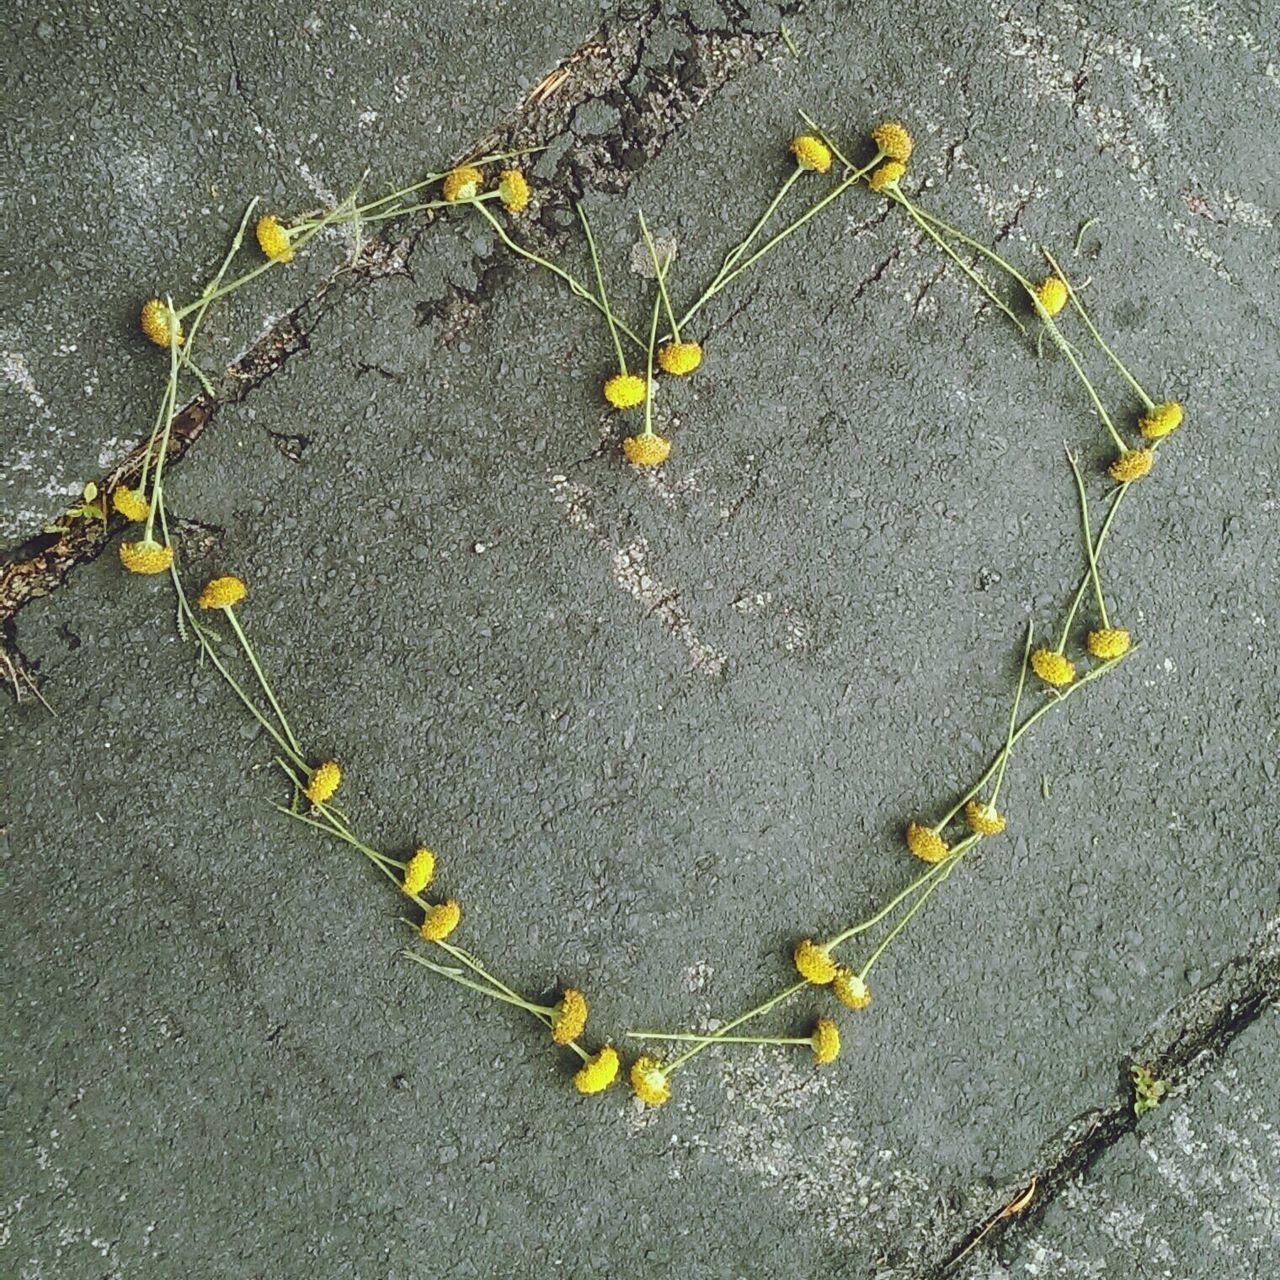 Heart shape made by flowers on street